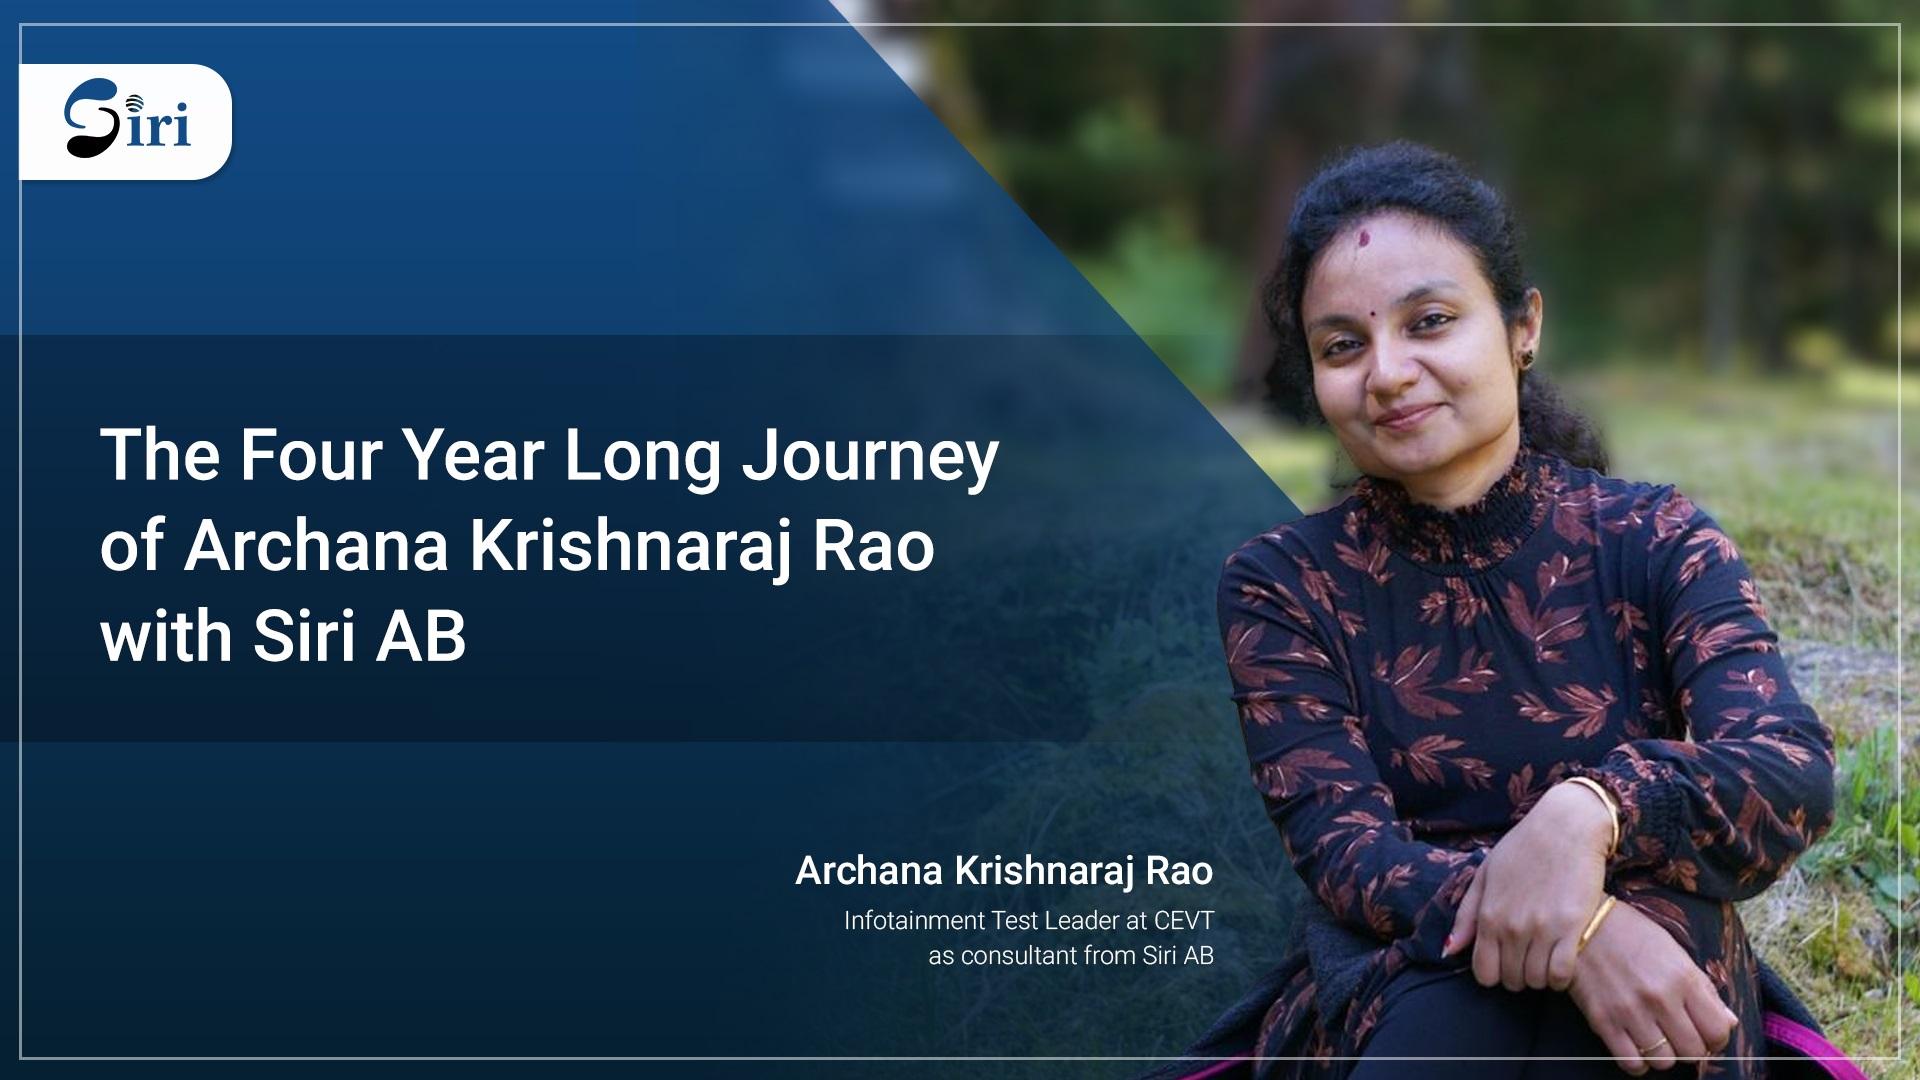 Archana Krishnaraj Rao Siri AB